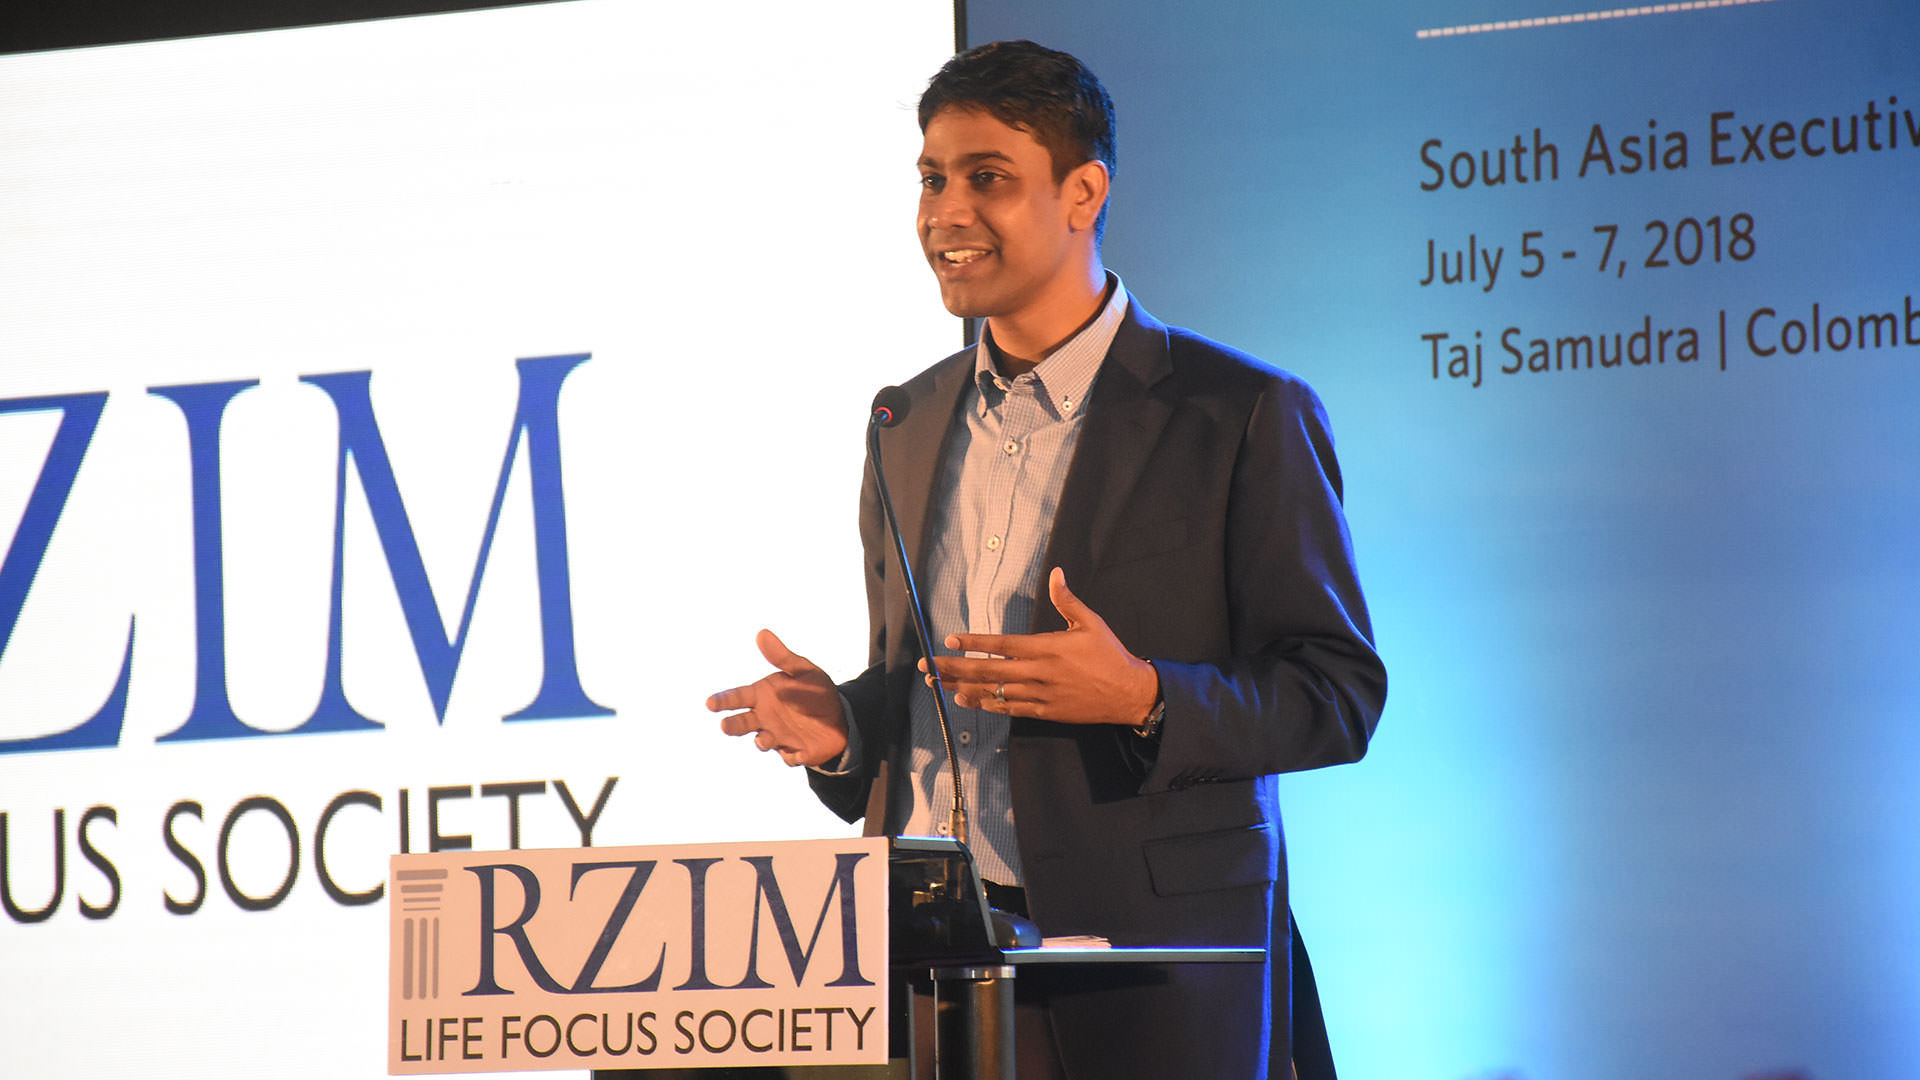 Dr. Daniel Thejus (Bobby) RZIM India